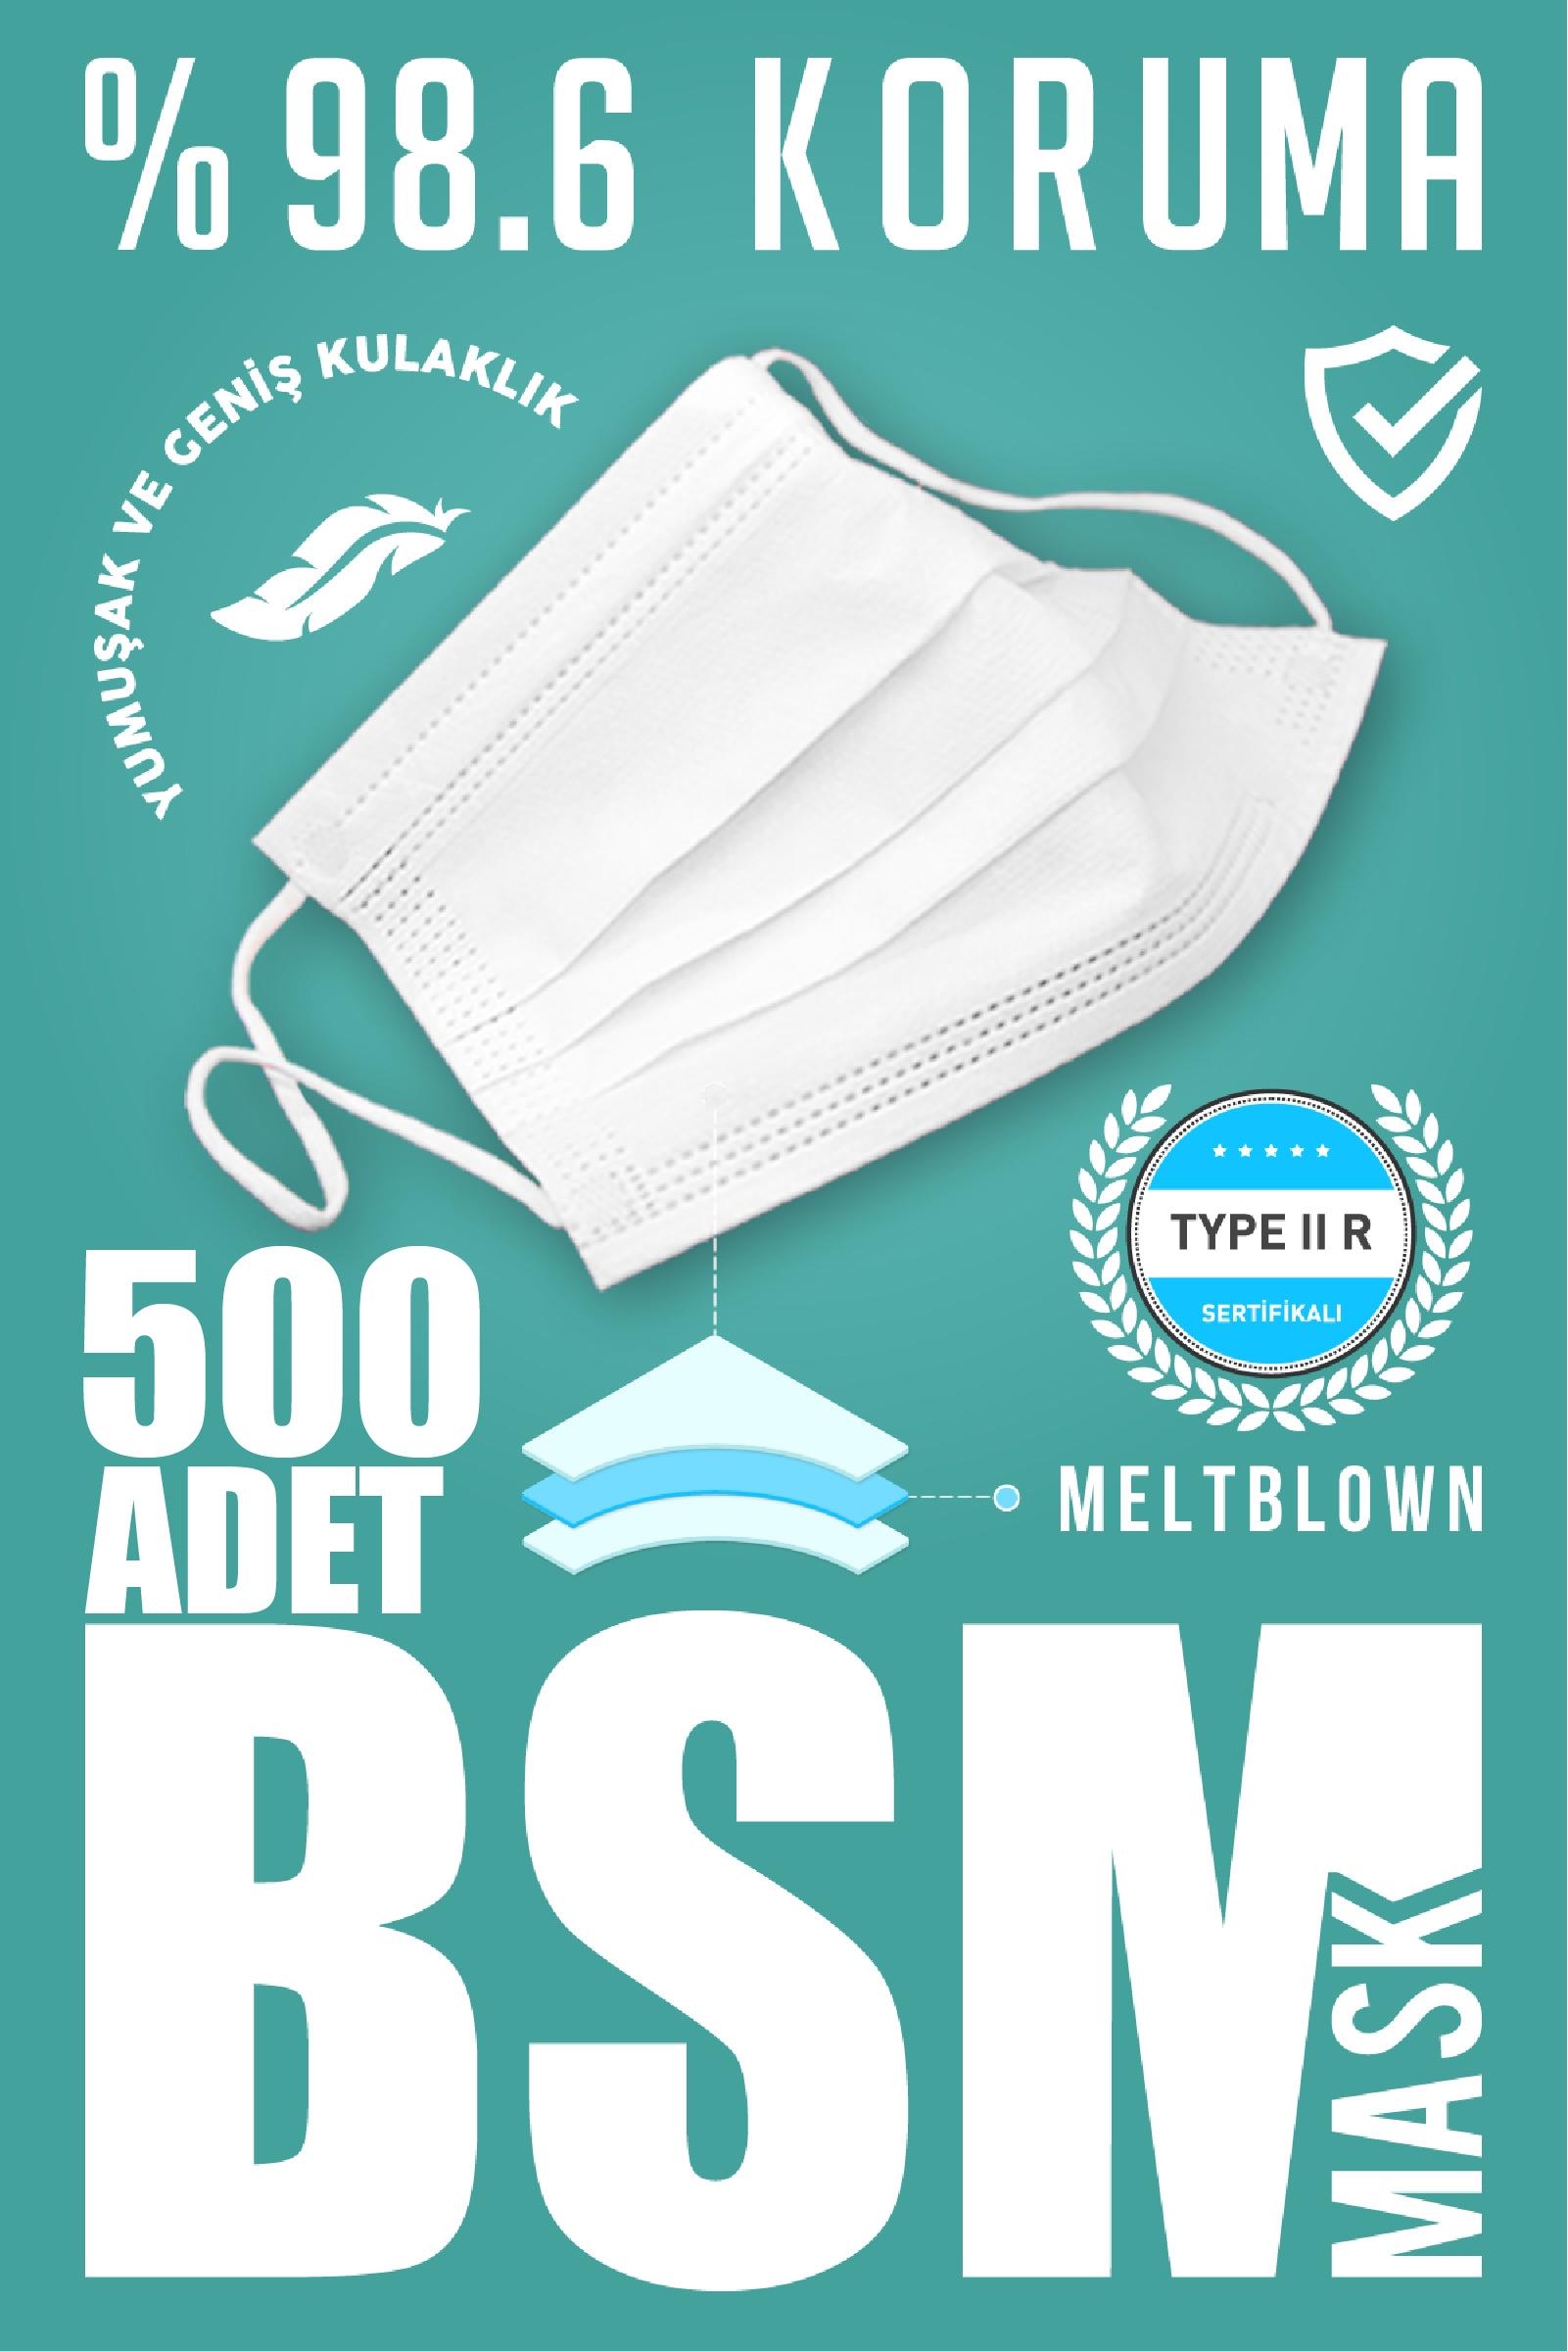 BSM 3 Katlı Yassı Lastikli MELTBLOWN Cerrahi Maske Toplam 500 Adet